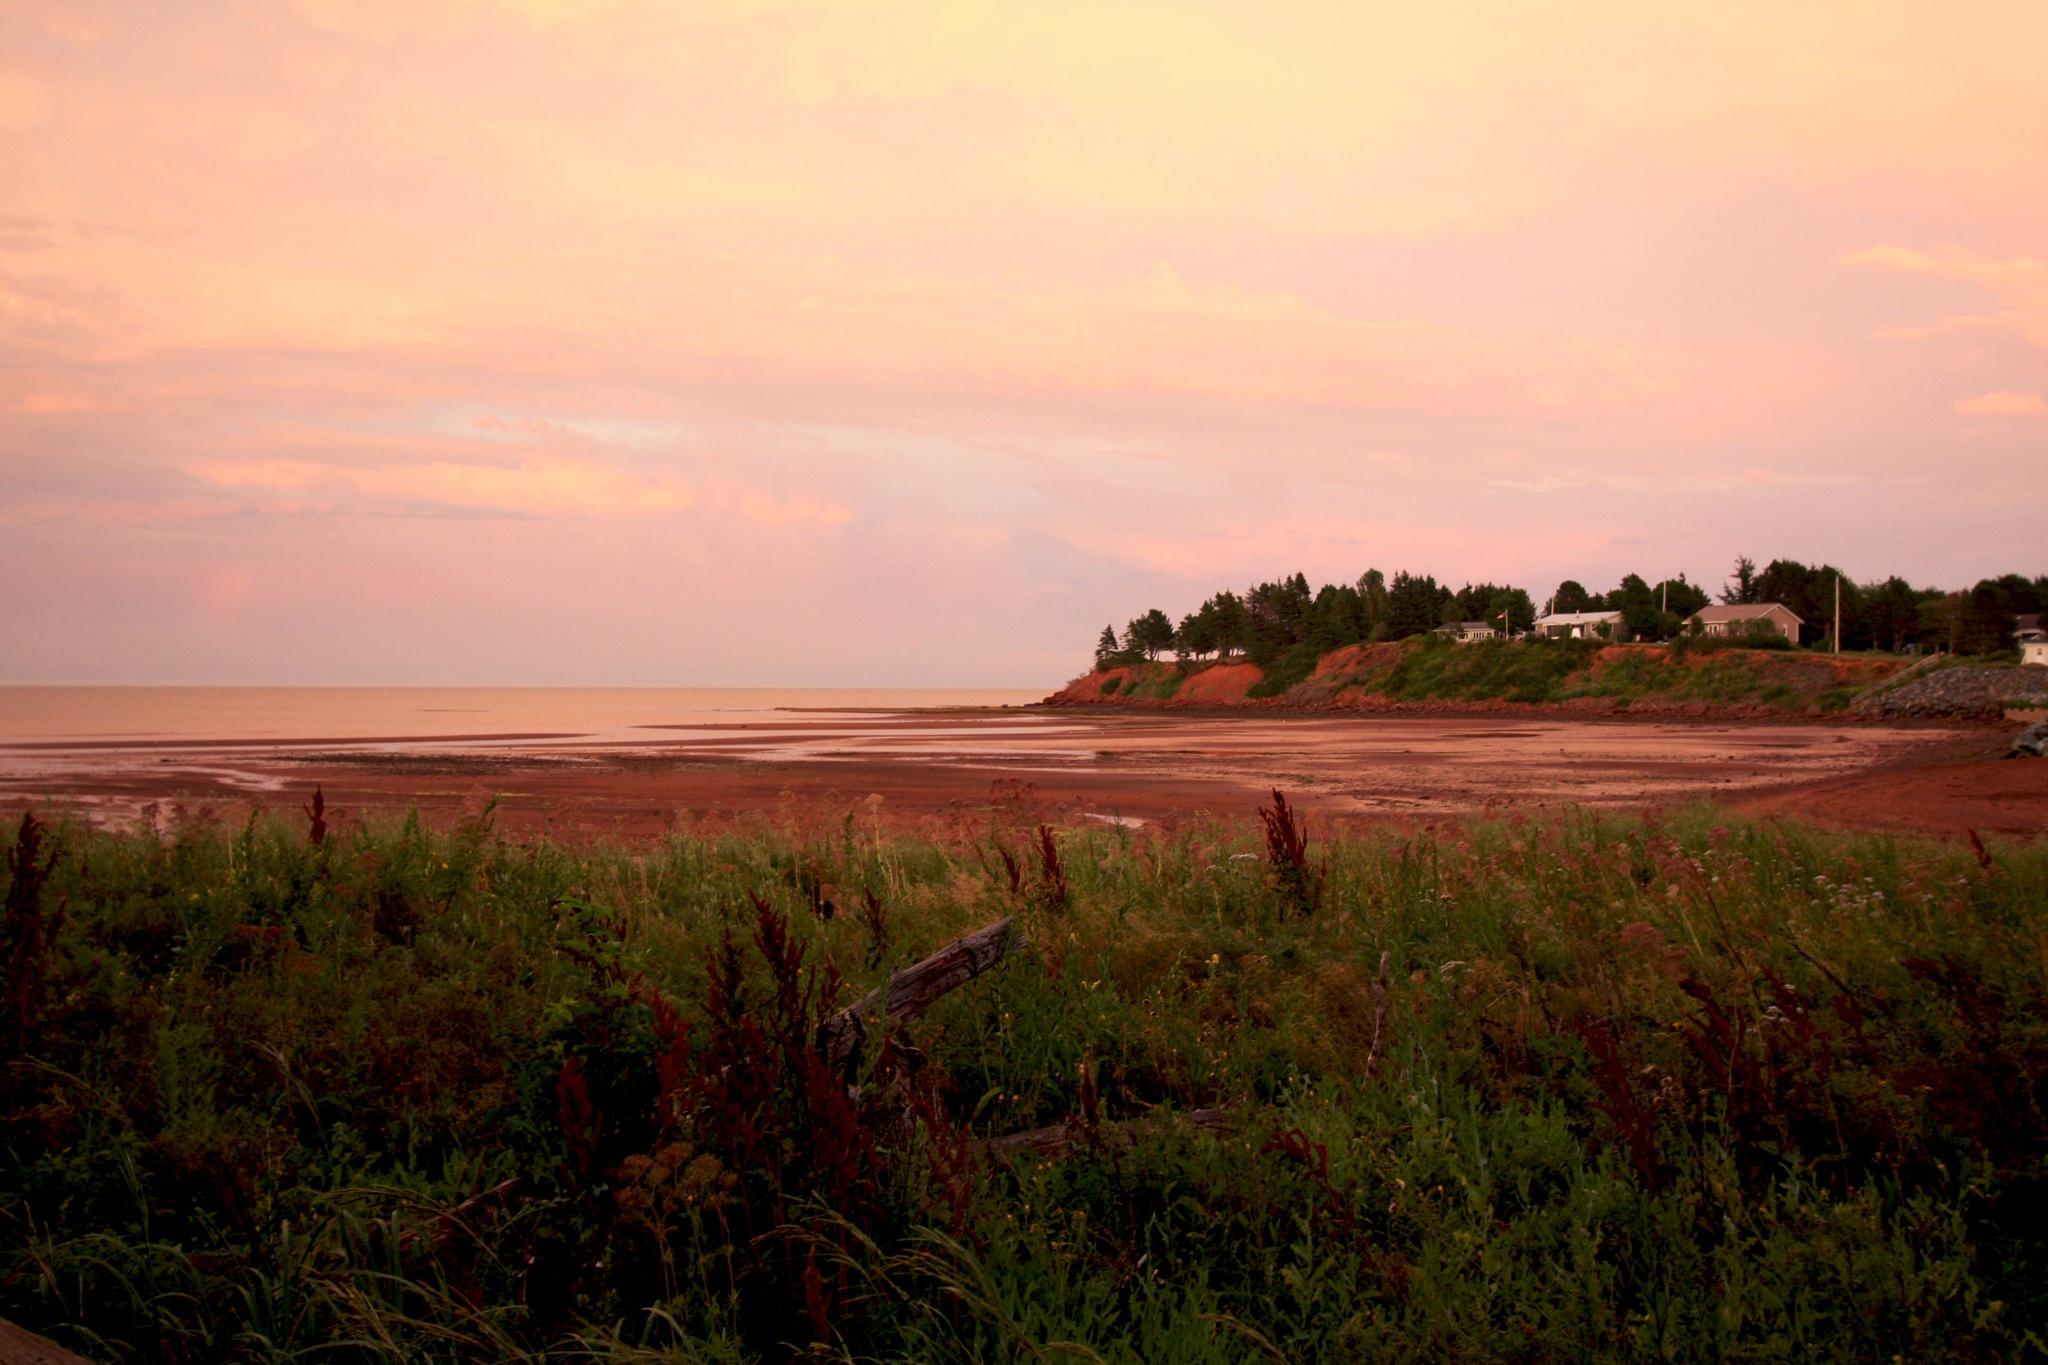 Amherst Provincial Park, Nova Scotia by Wendy Farrington